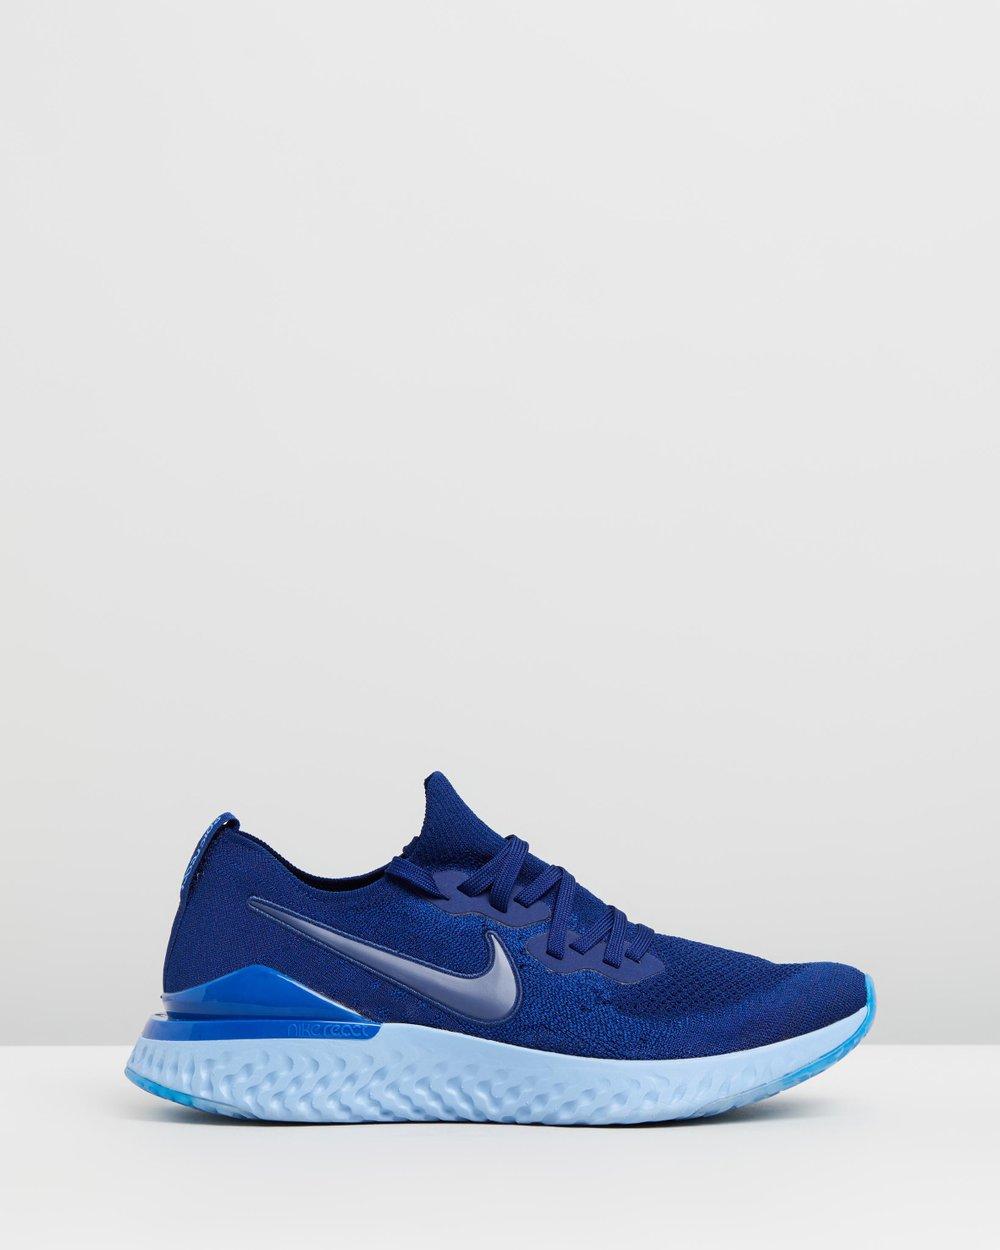 38b0c3b0edecf Epic React Flyknit 2 - Men s by Nike Online